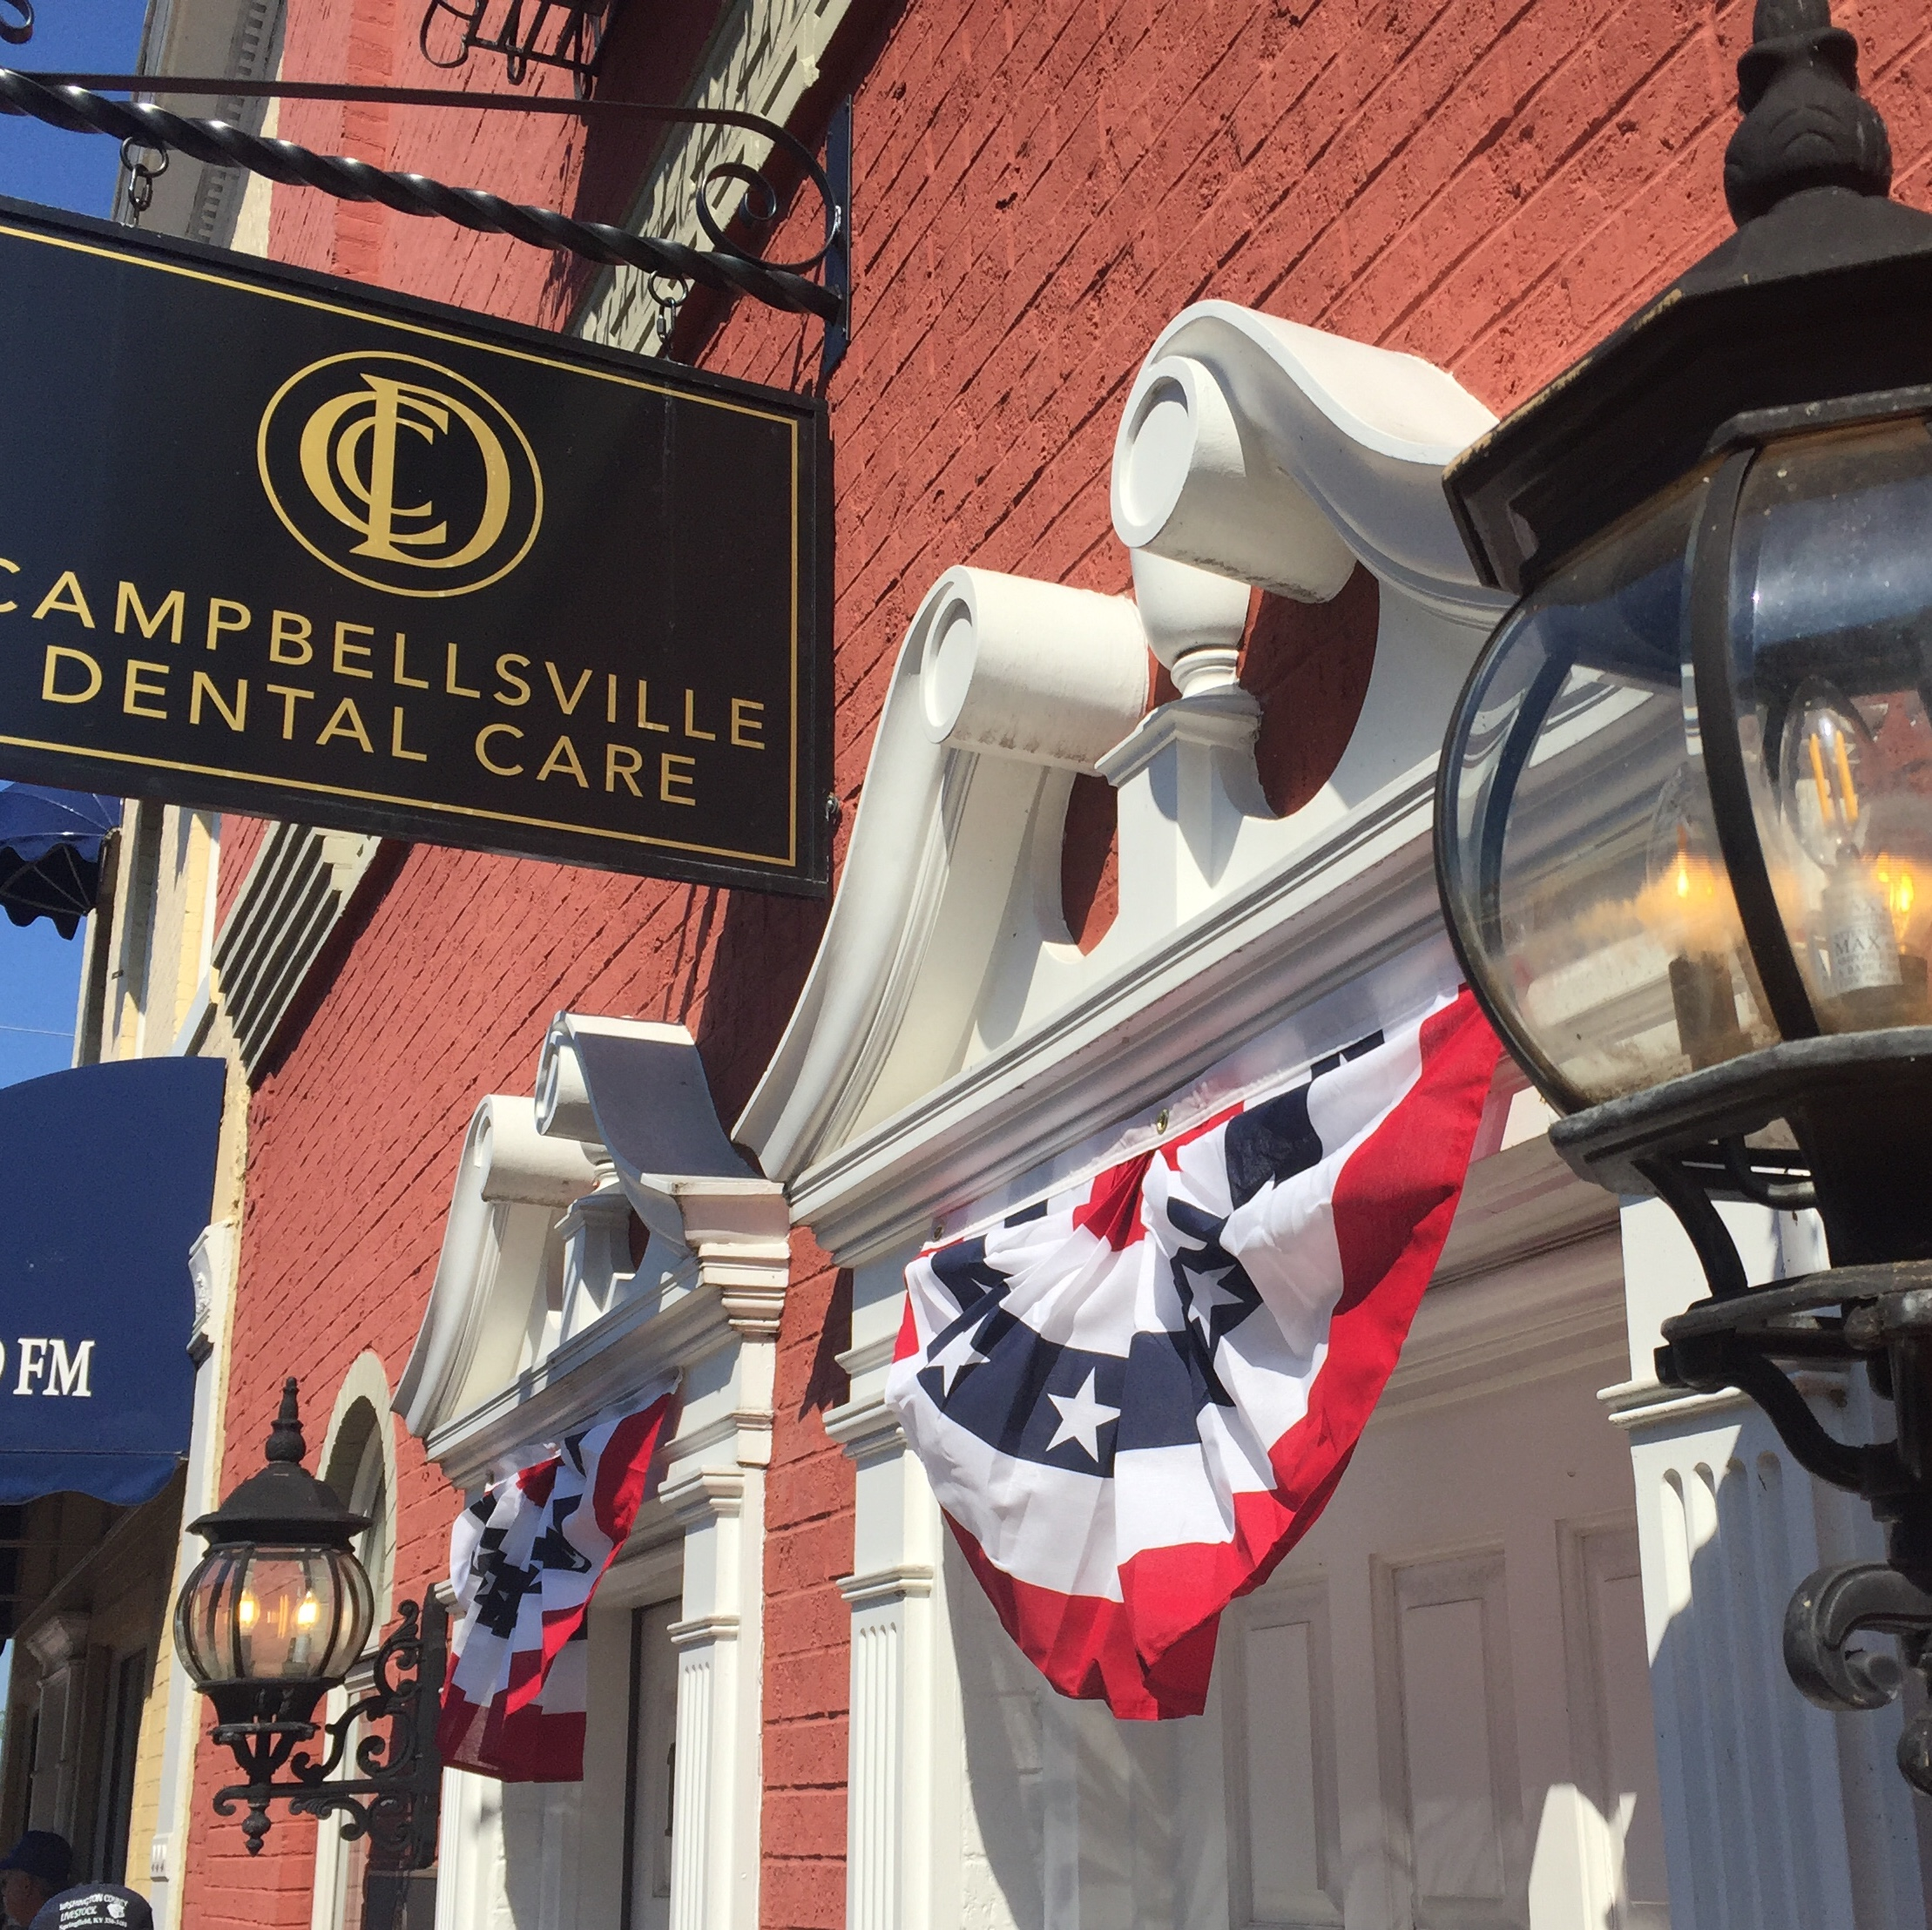 Campbellsville Dental Care